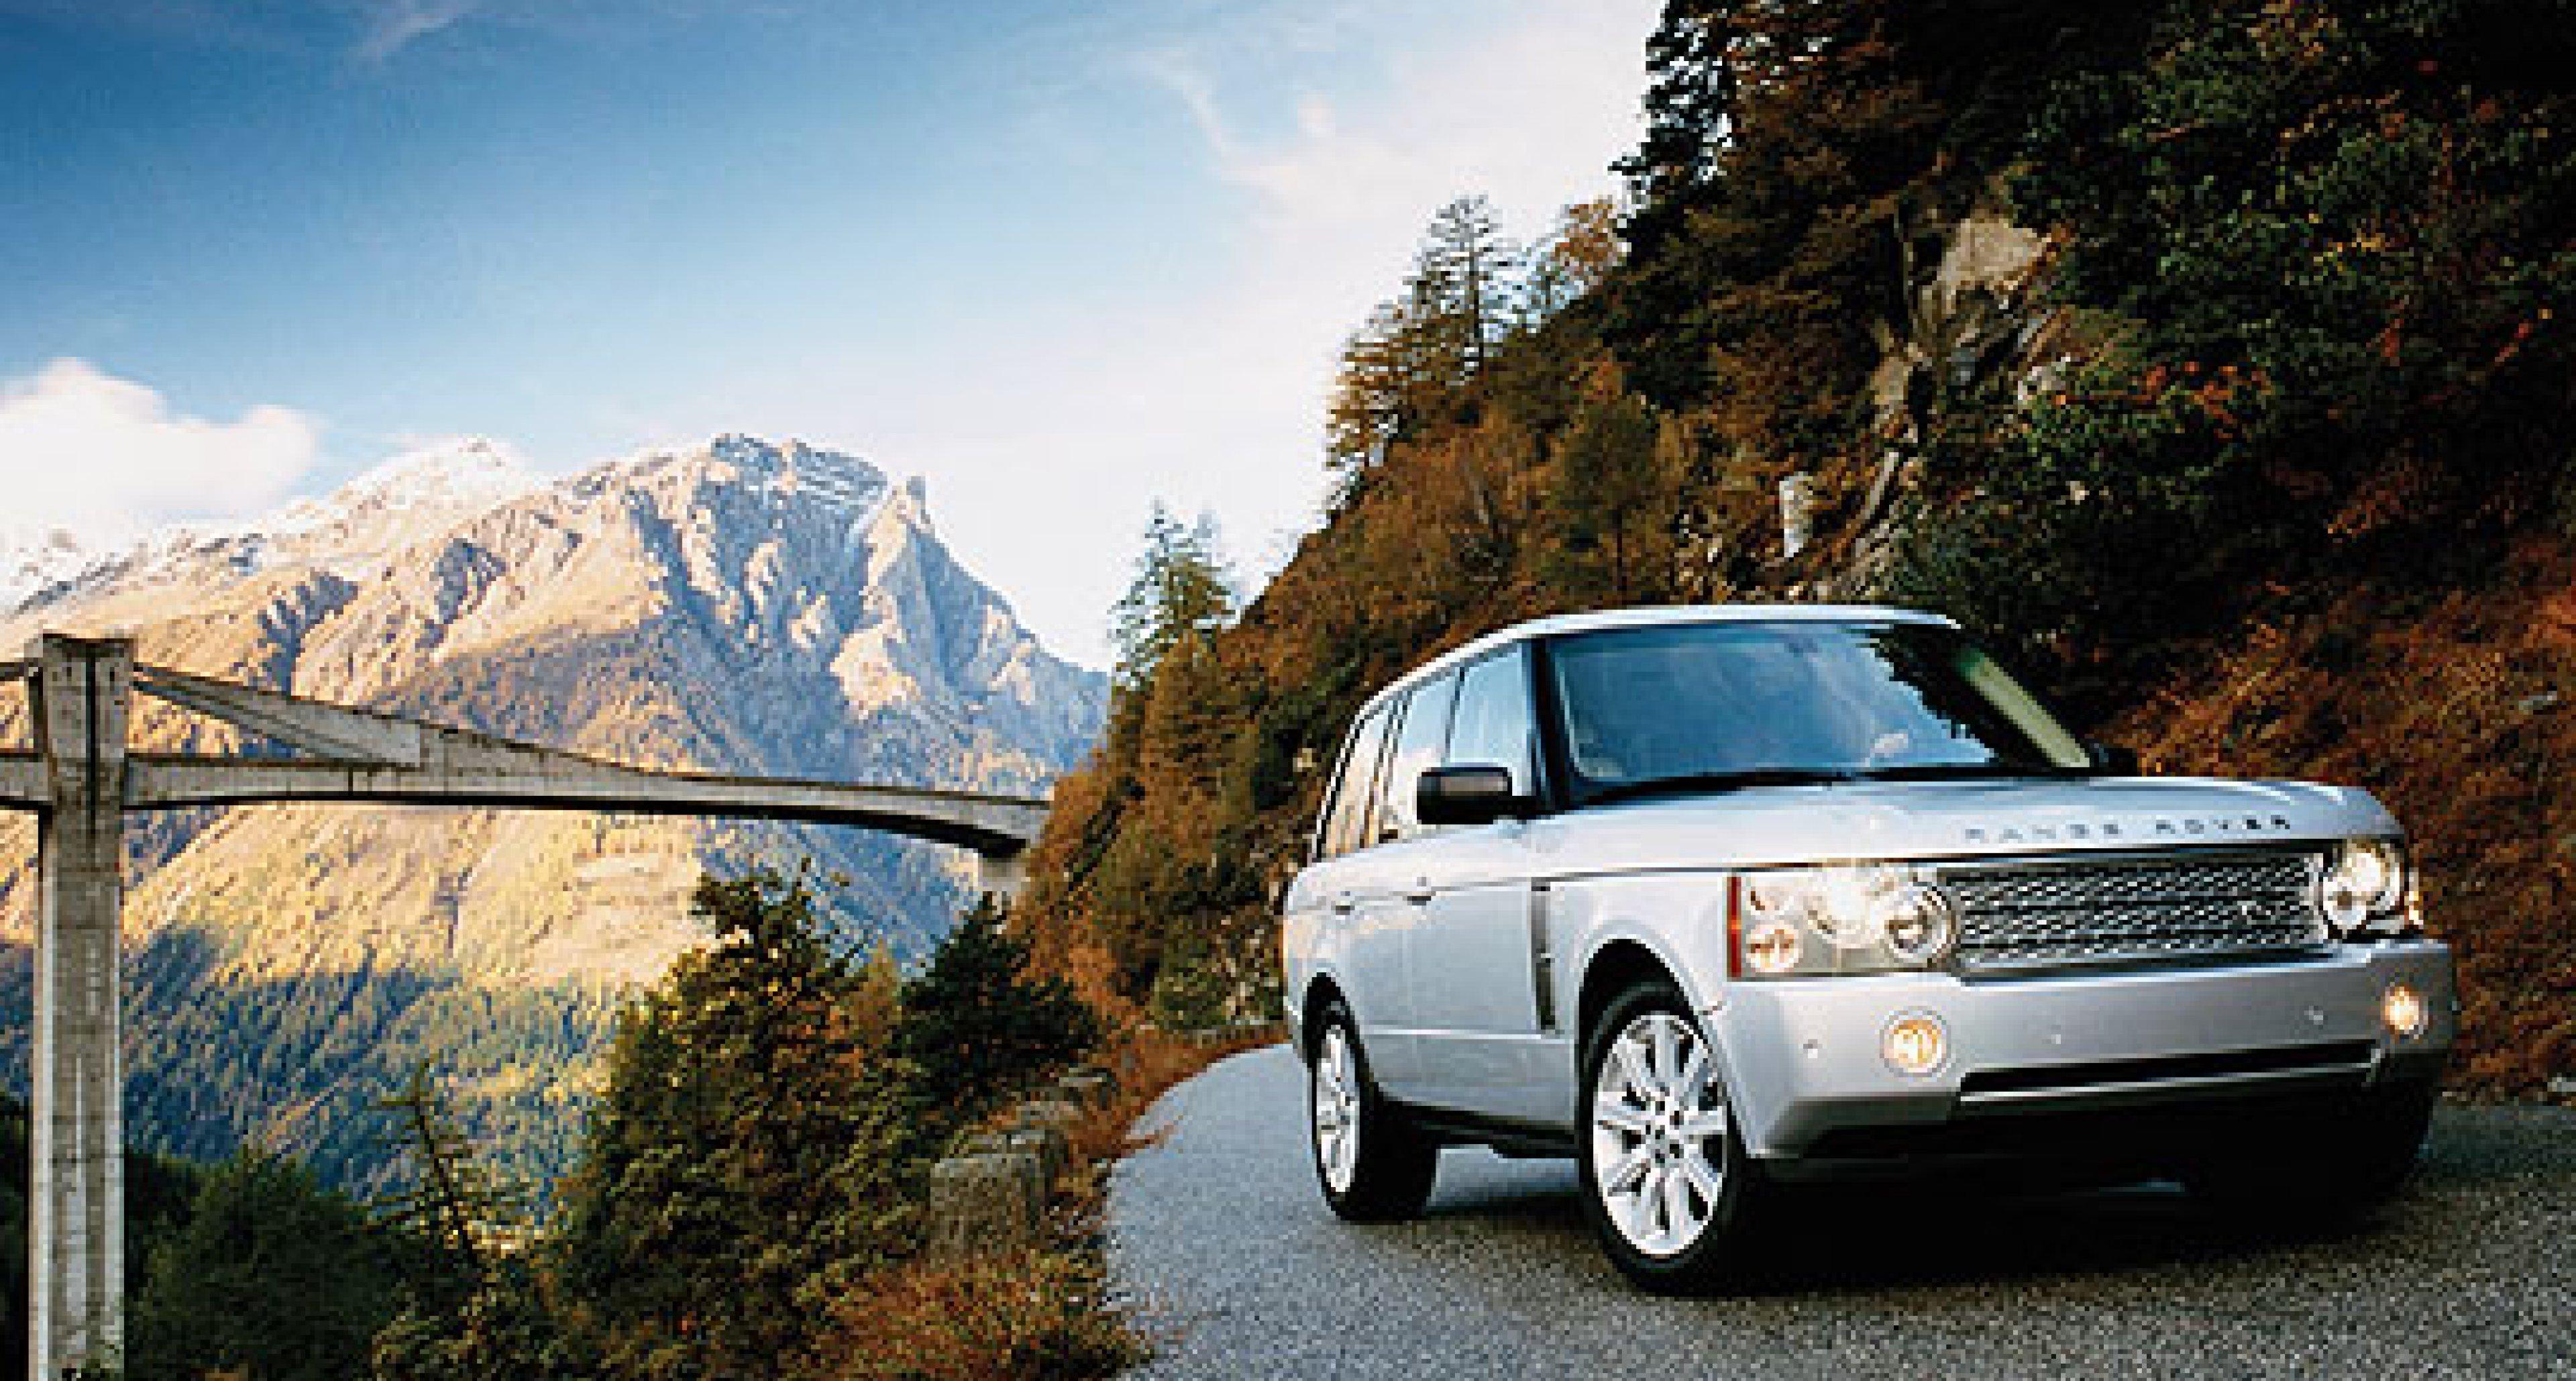 Range Rover Modelljahr 2006